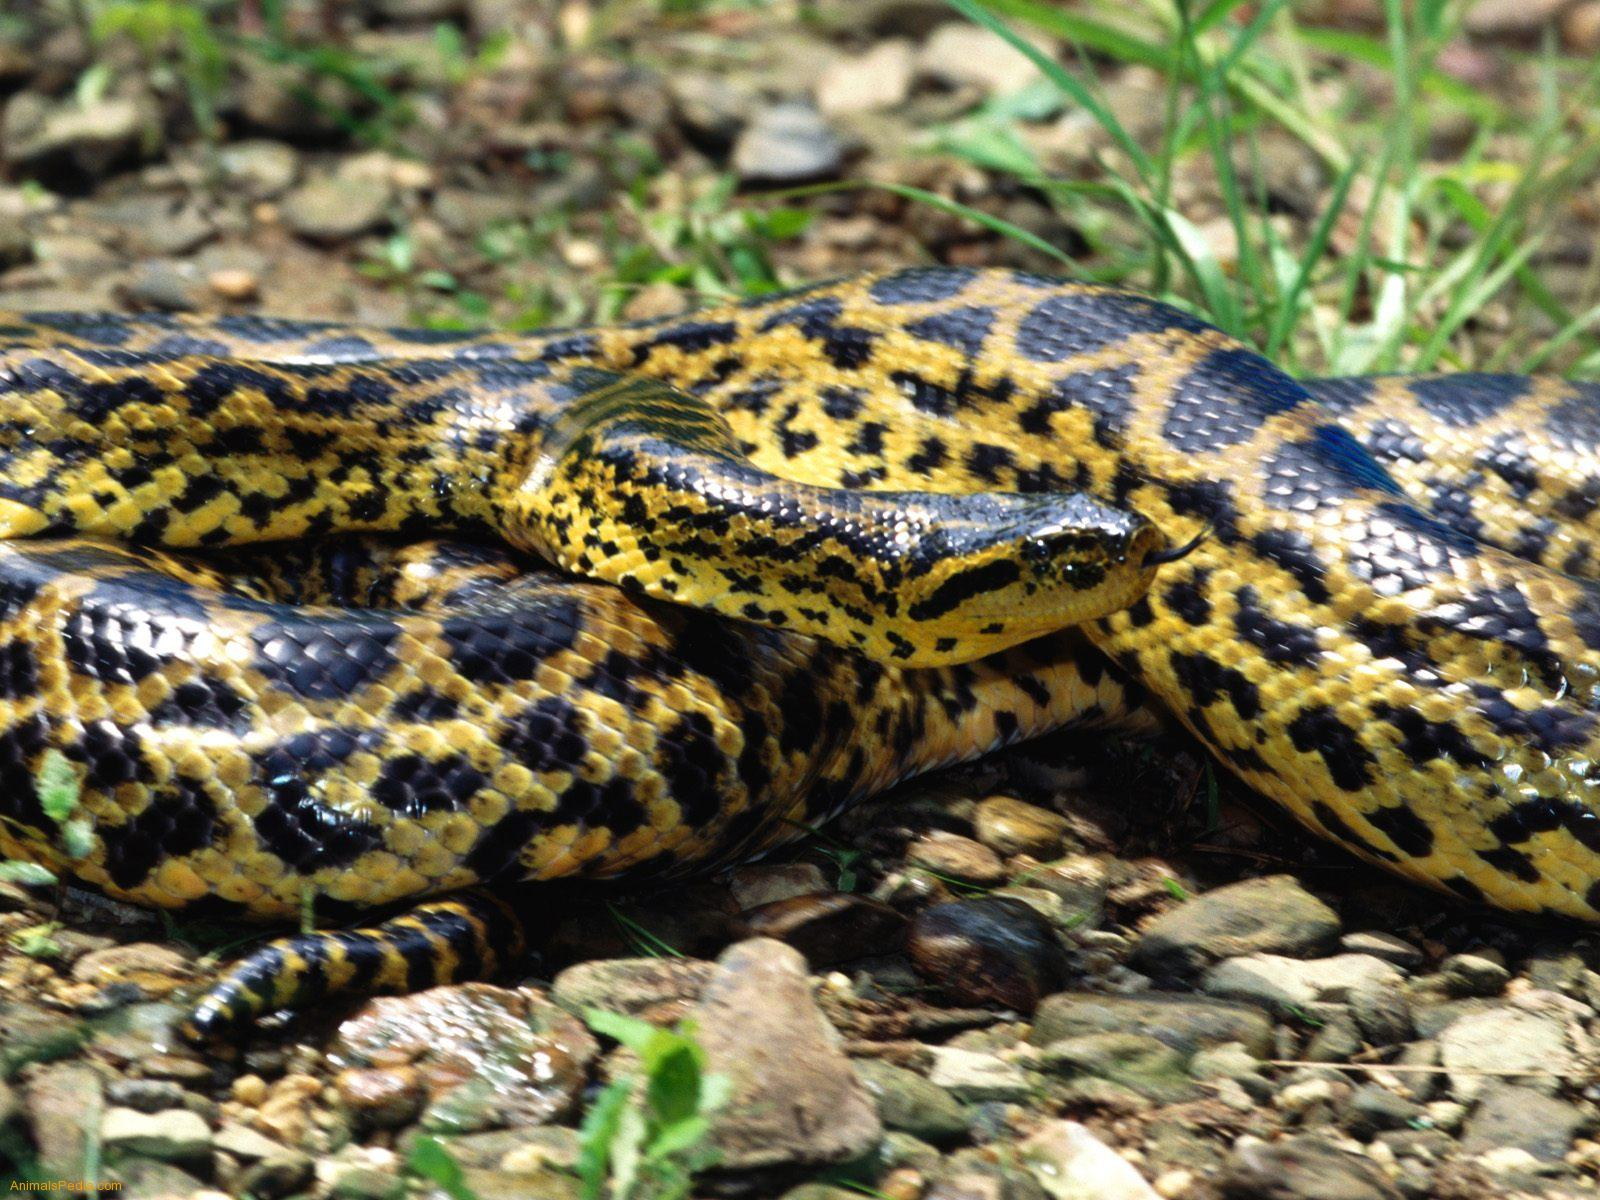 Anaconda Snakes information | Animals Blog